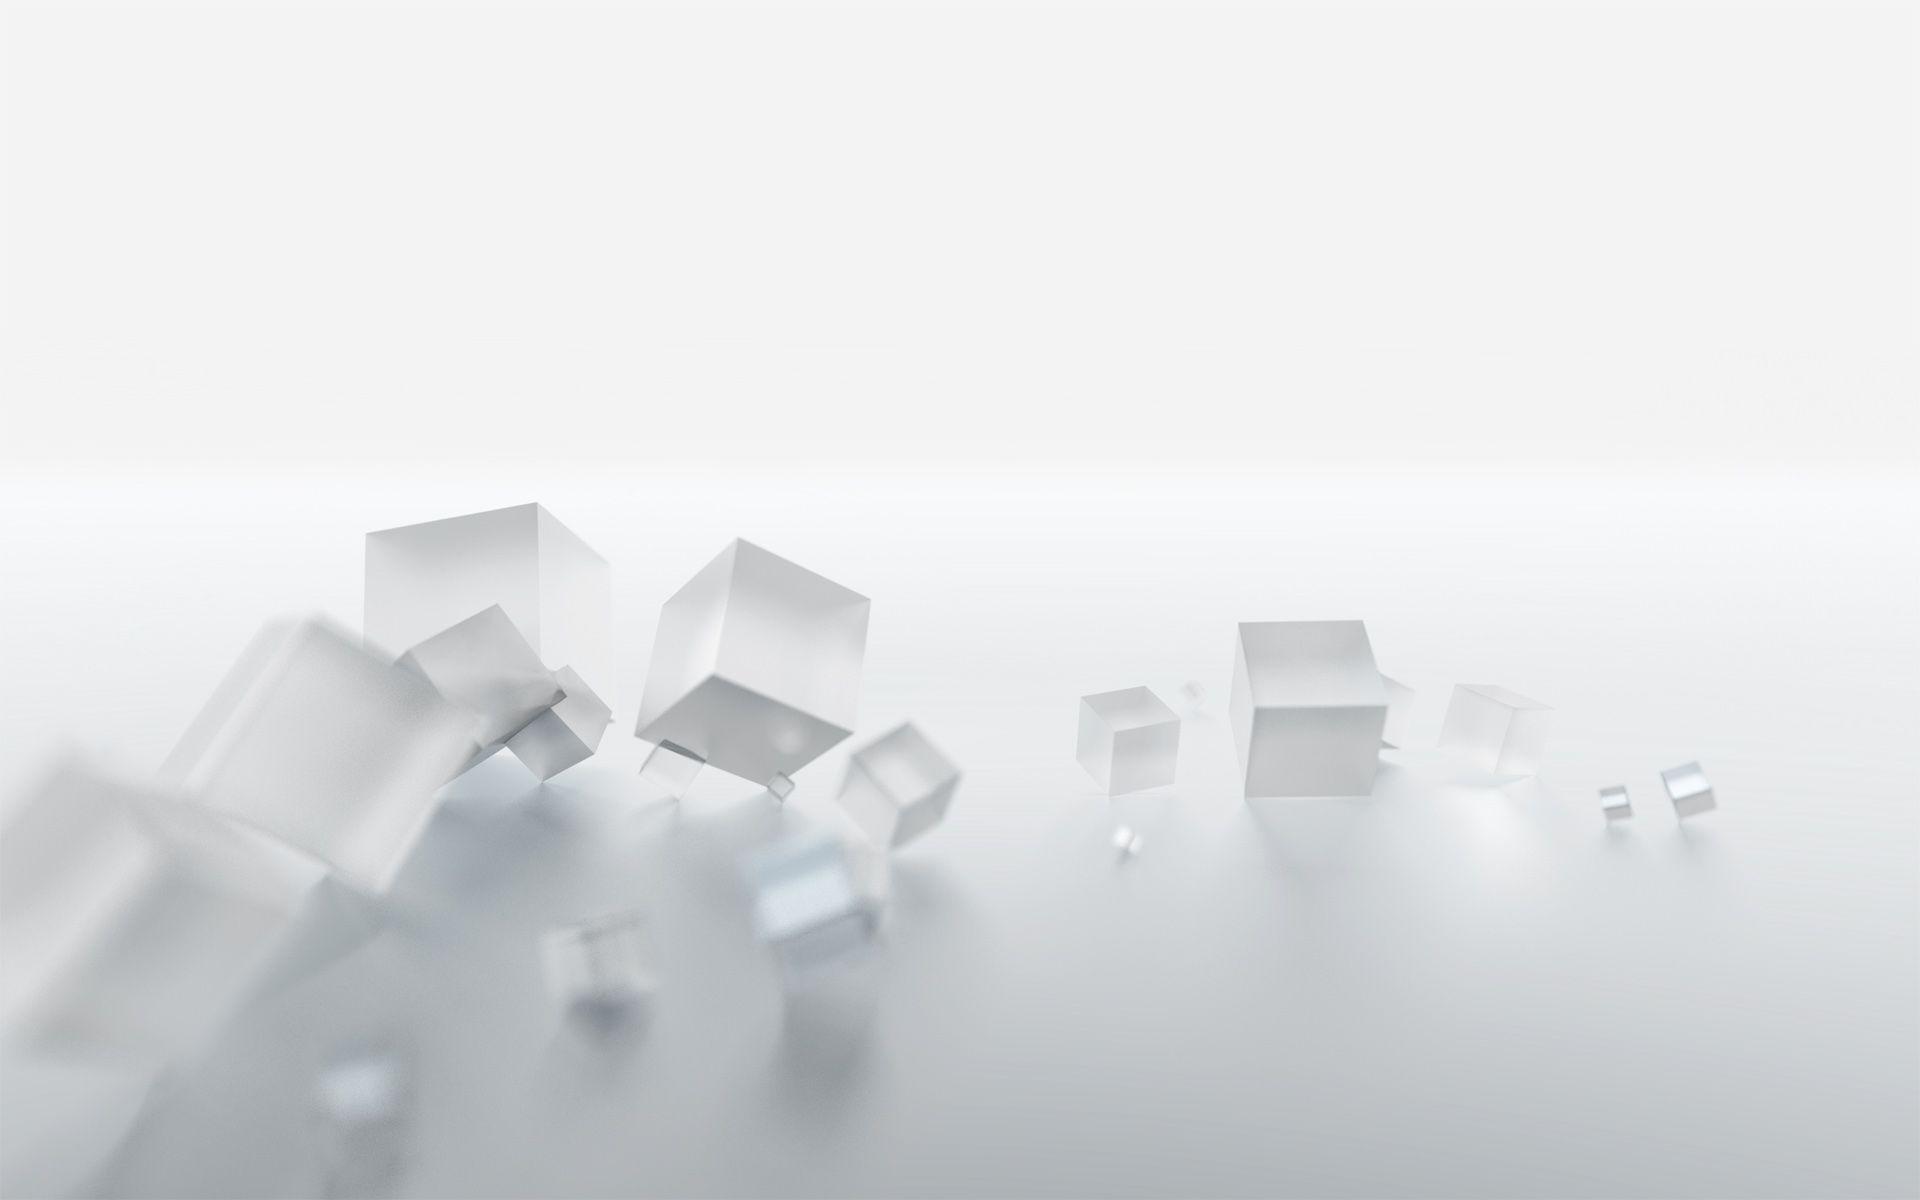 White Desktop Wallpapers   Top Free White Desktop Backgrounds ...